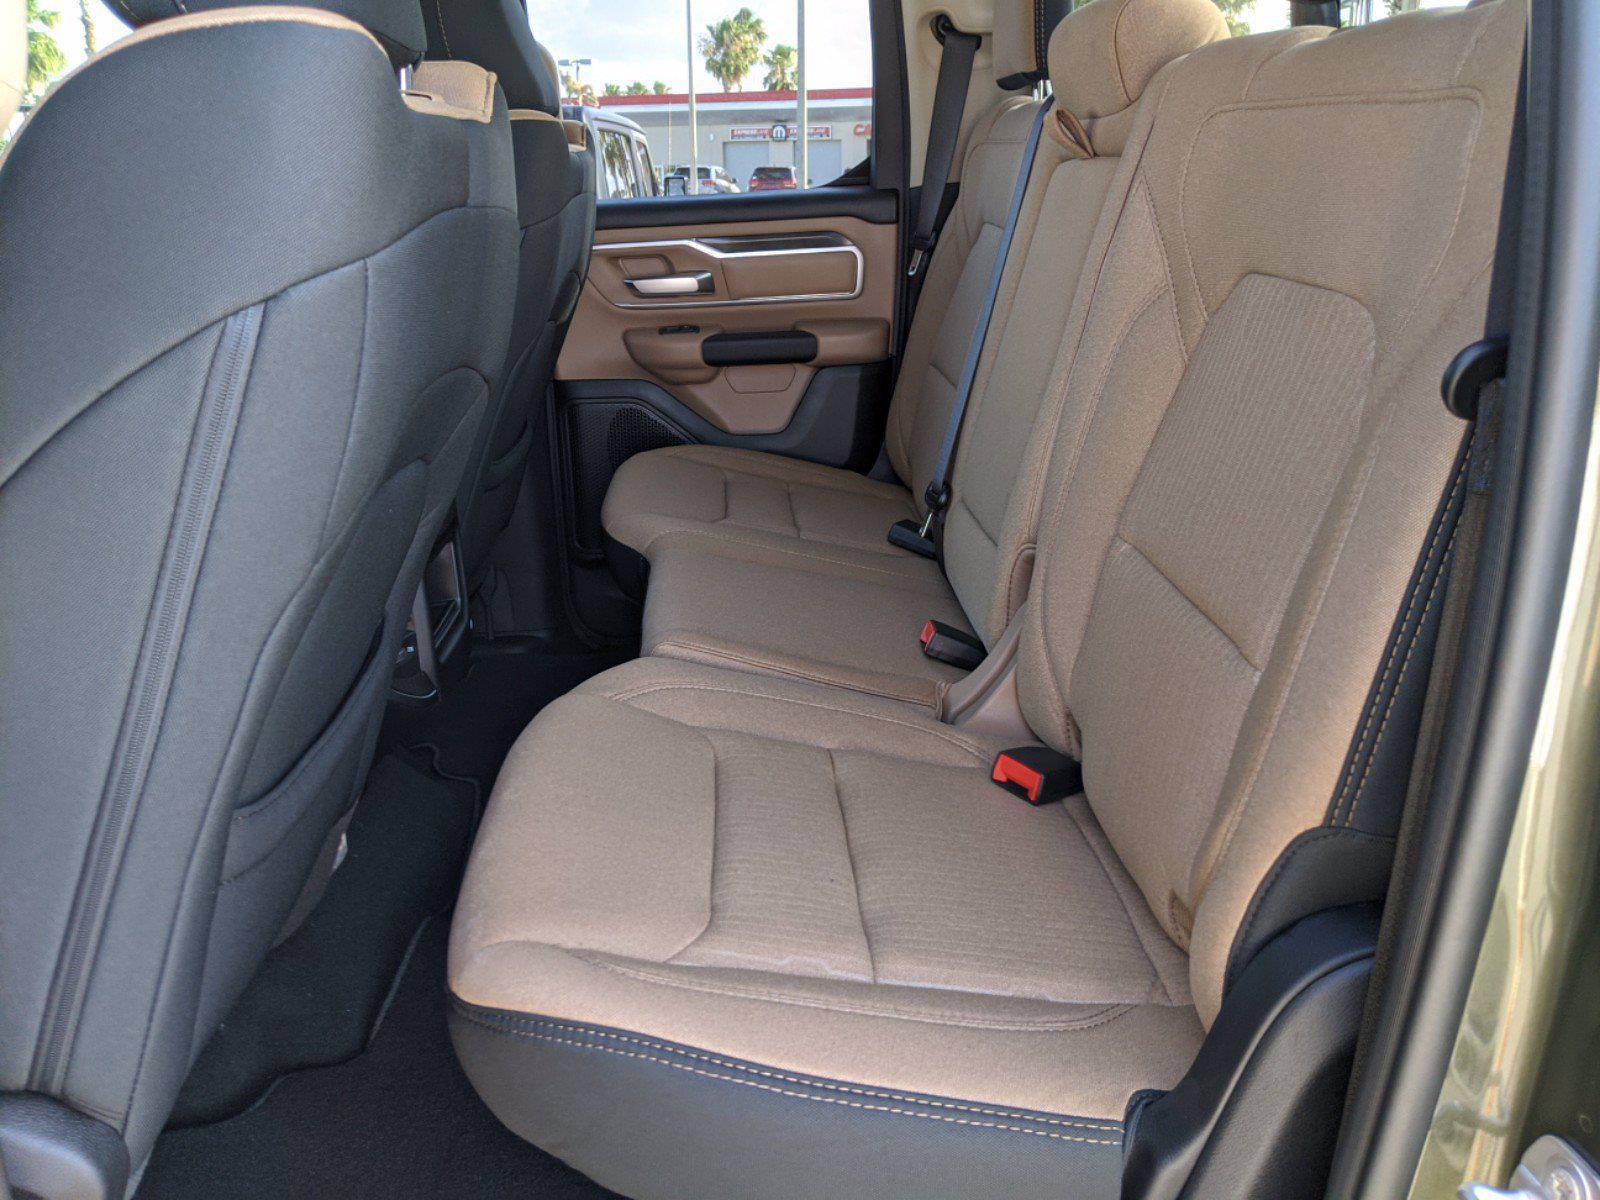 2021 Ram 1500 Quad Cab 4x2, Pickup #R21329 - photo 1